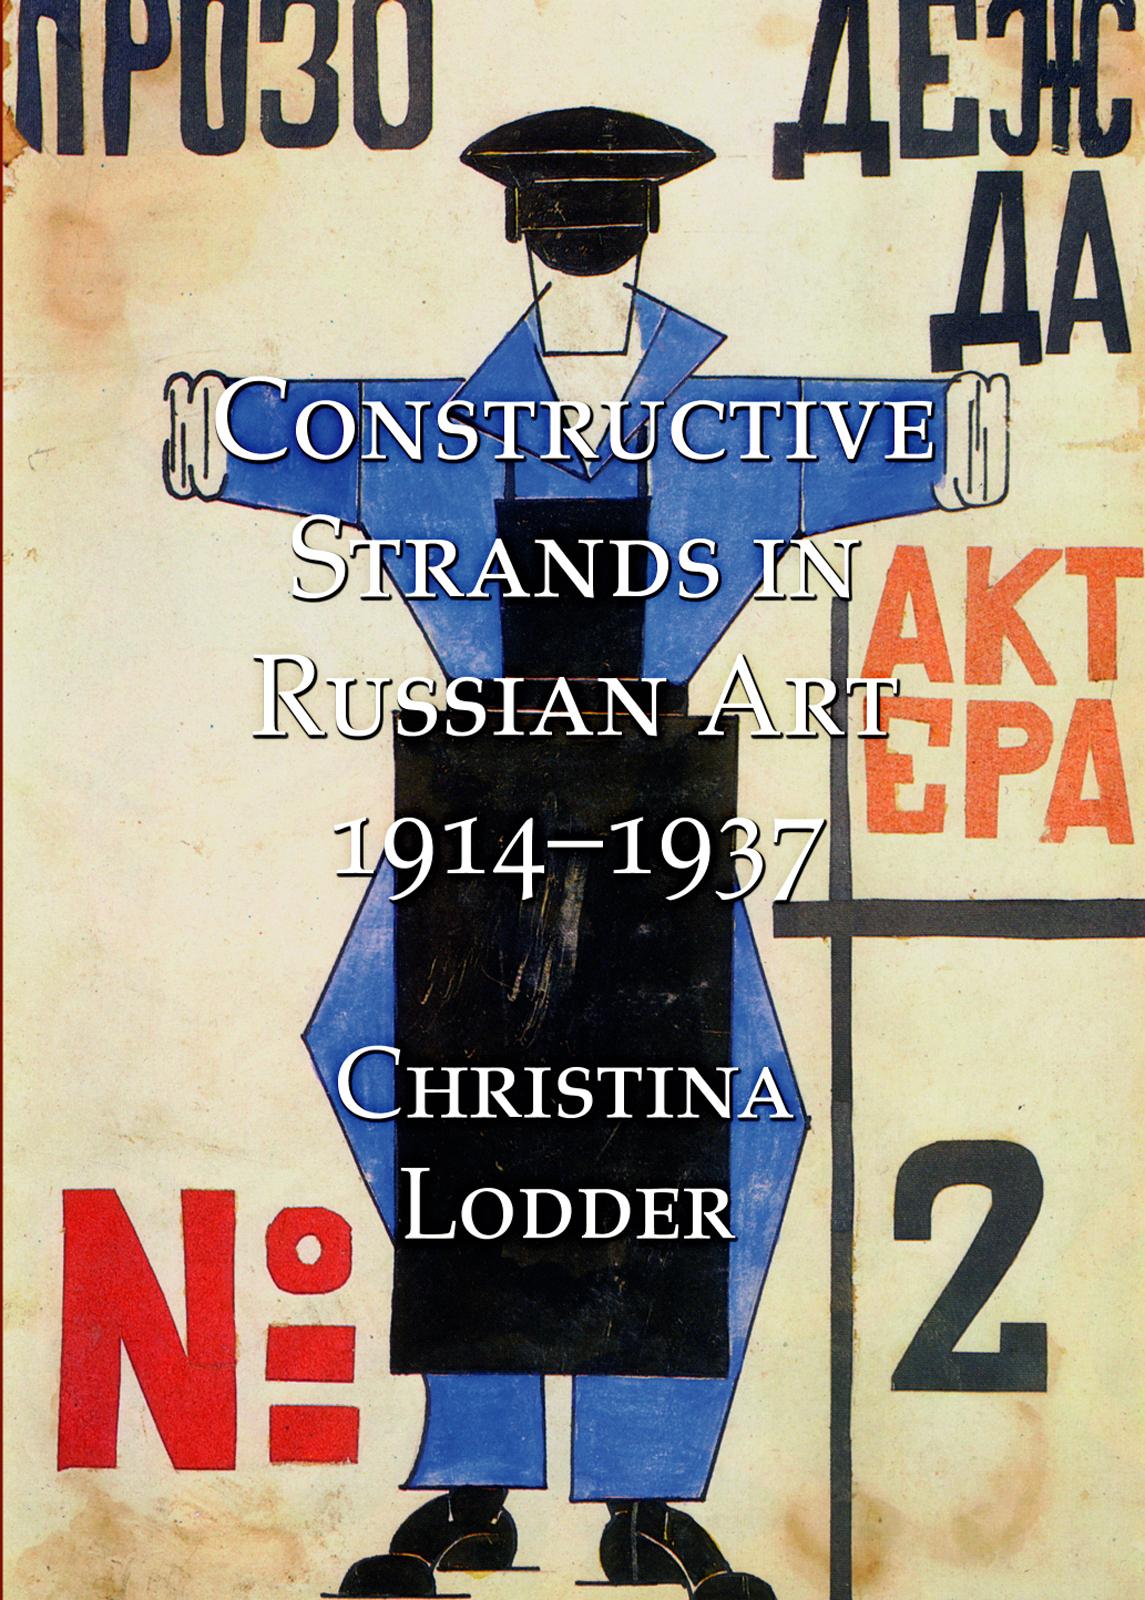 Christina Lodder